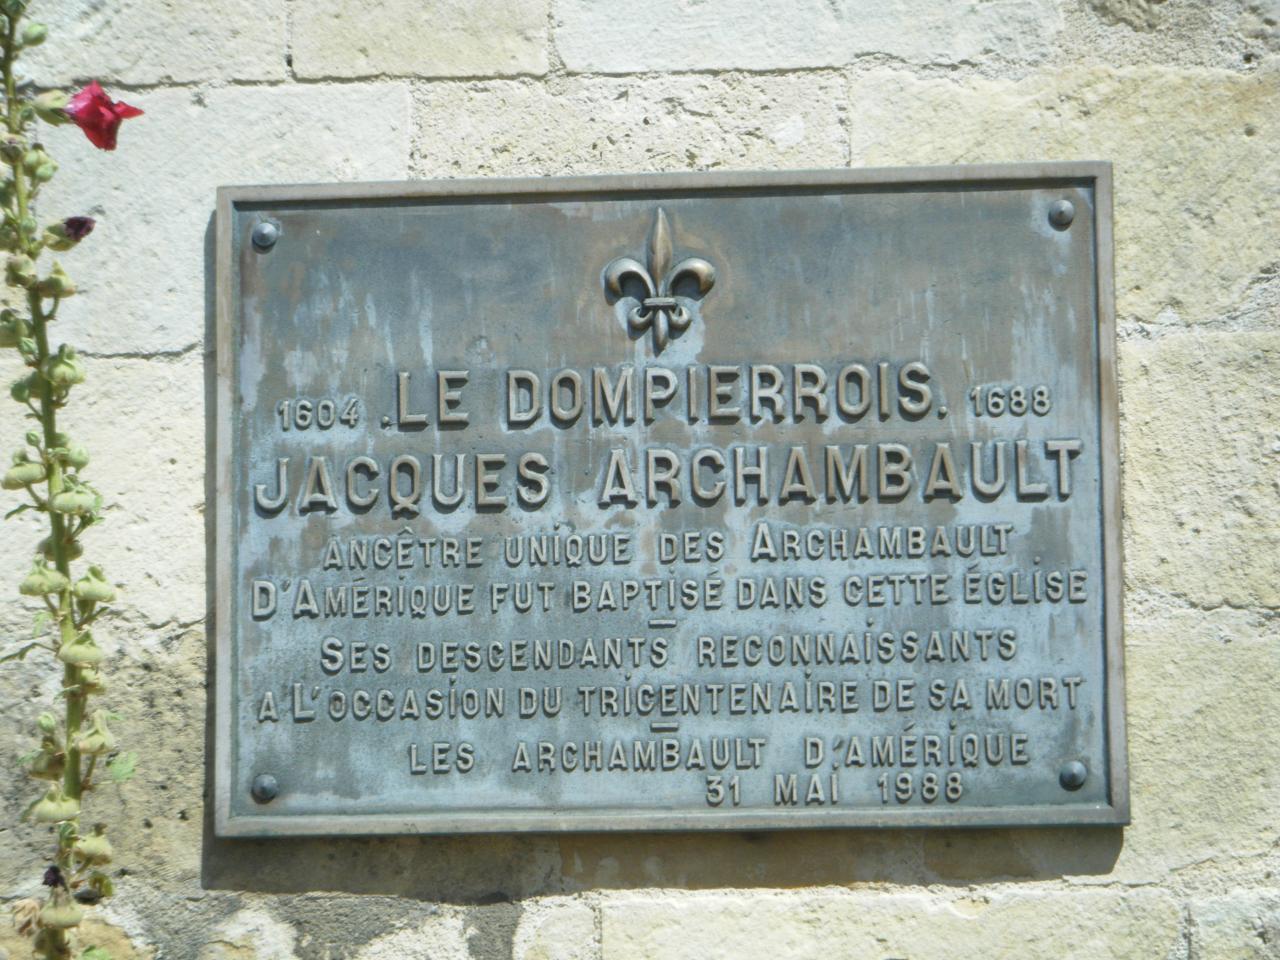 Bravo, Mr Archambault !